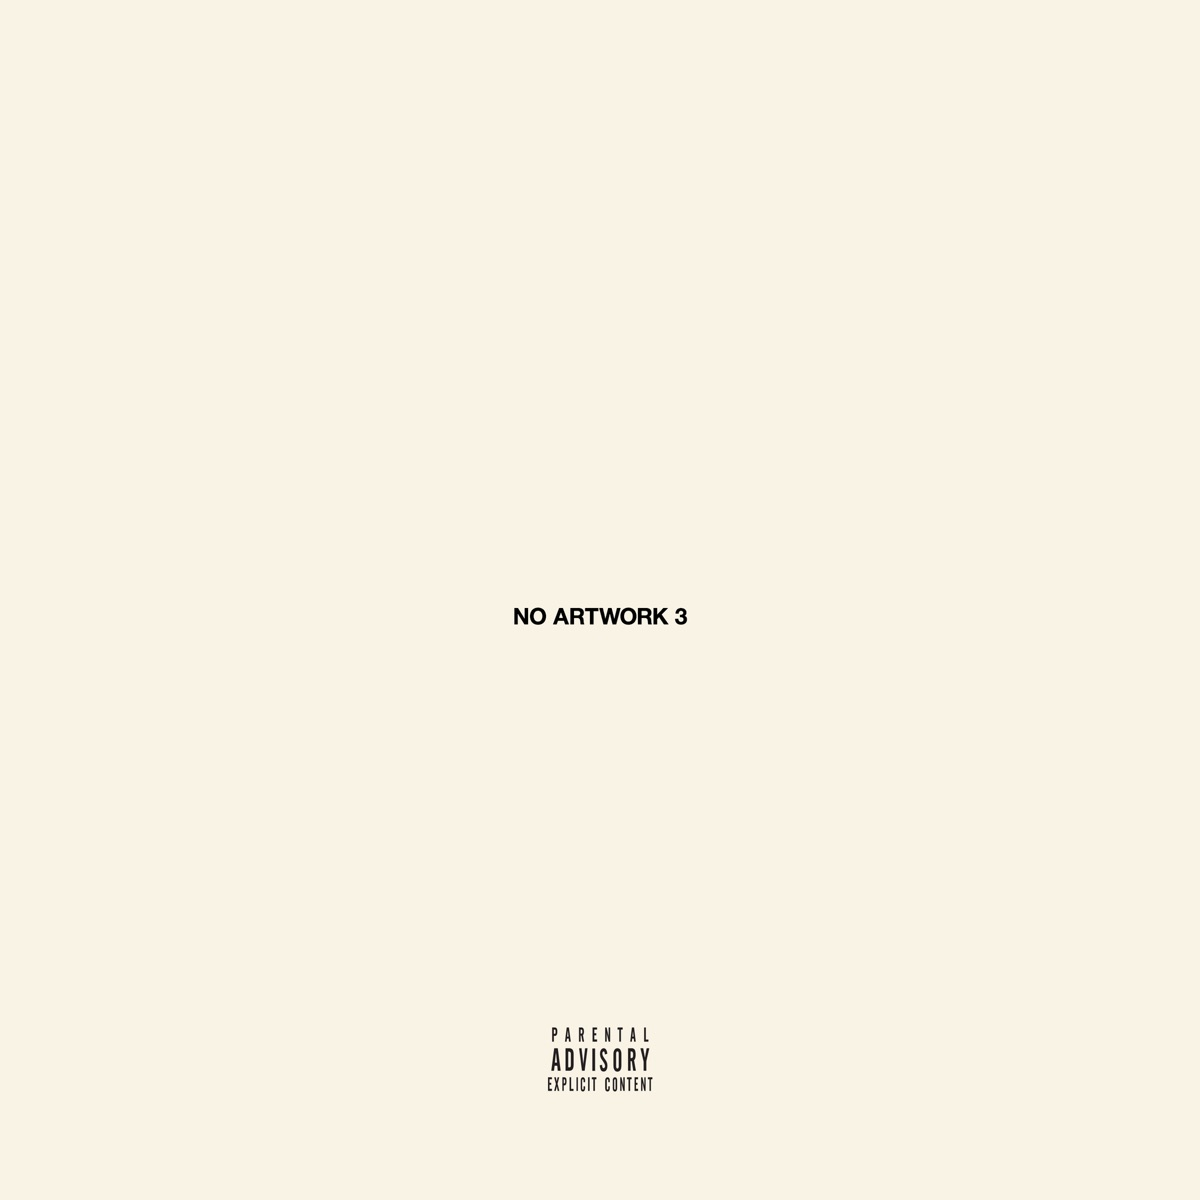 Champions - Single Kanye West Gucci Mane Big Sean 2 Chainz Travis Scott Yo Gotti Quavo  Desiigner CD cover